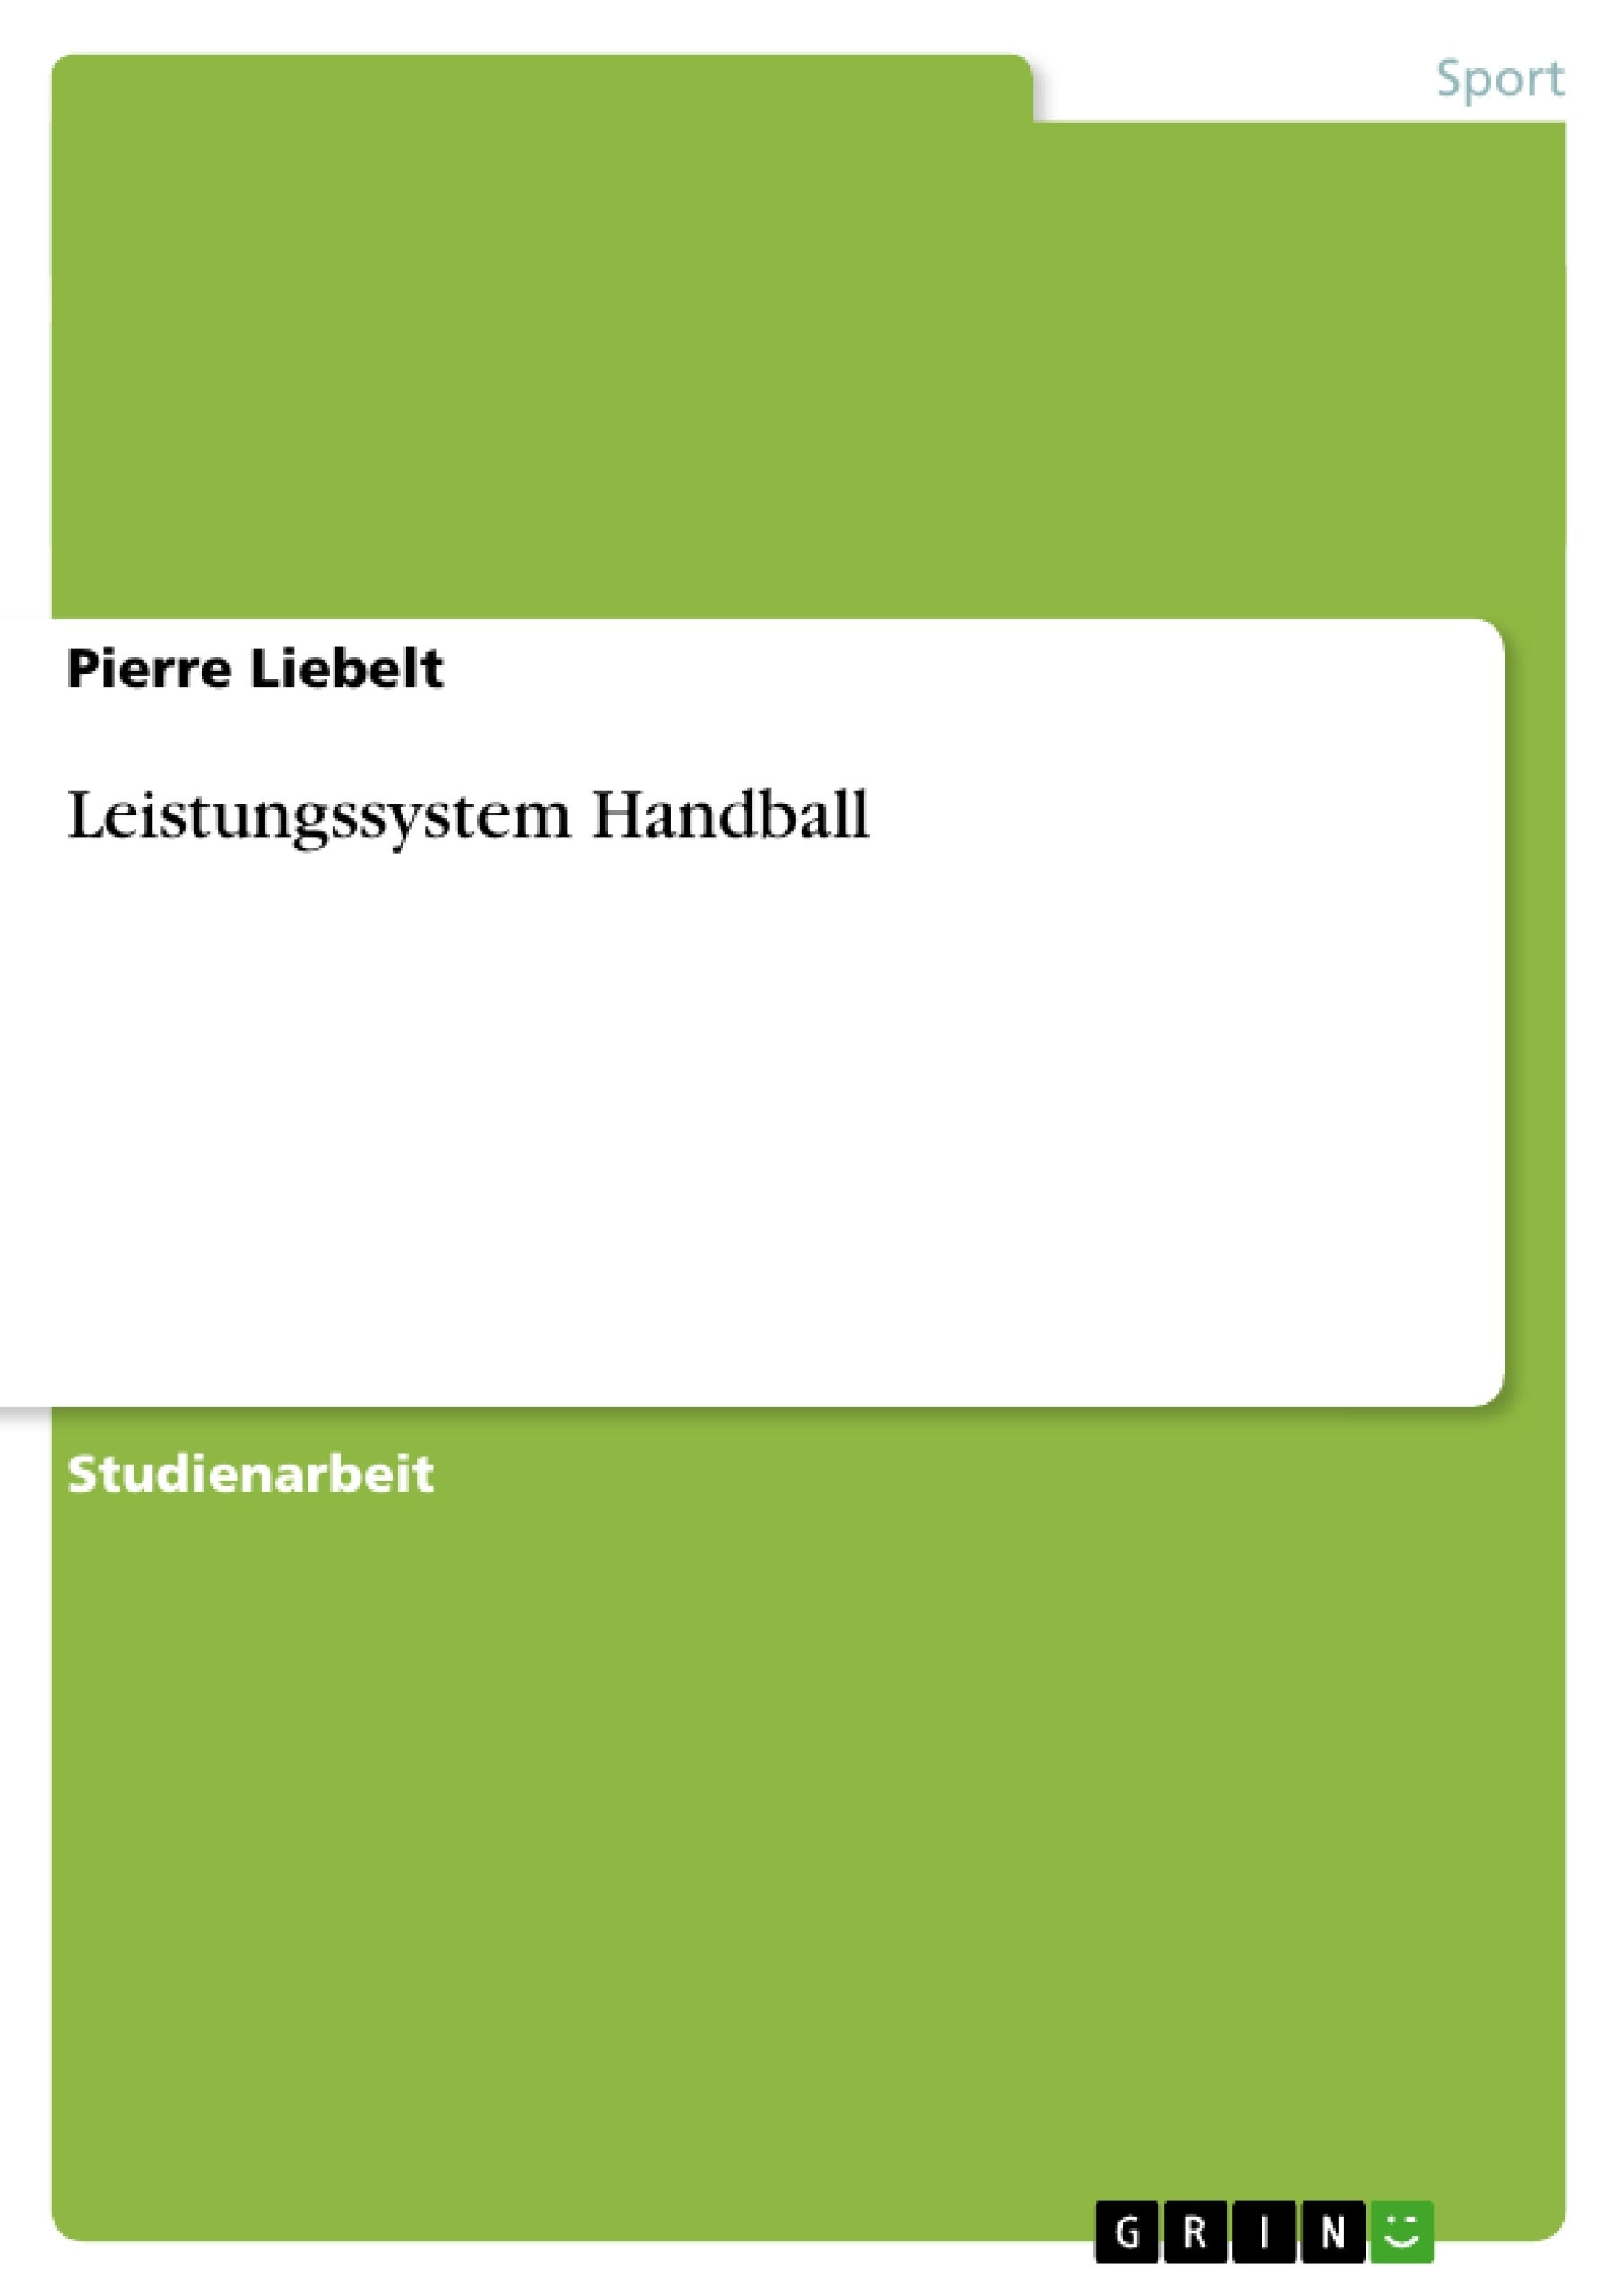 Titel: Leistungssystem Handball